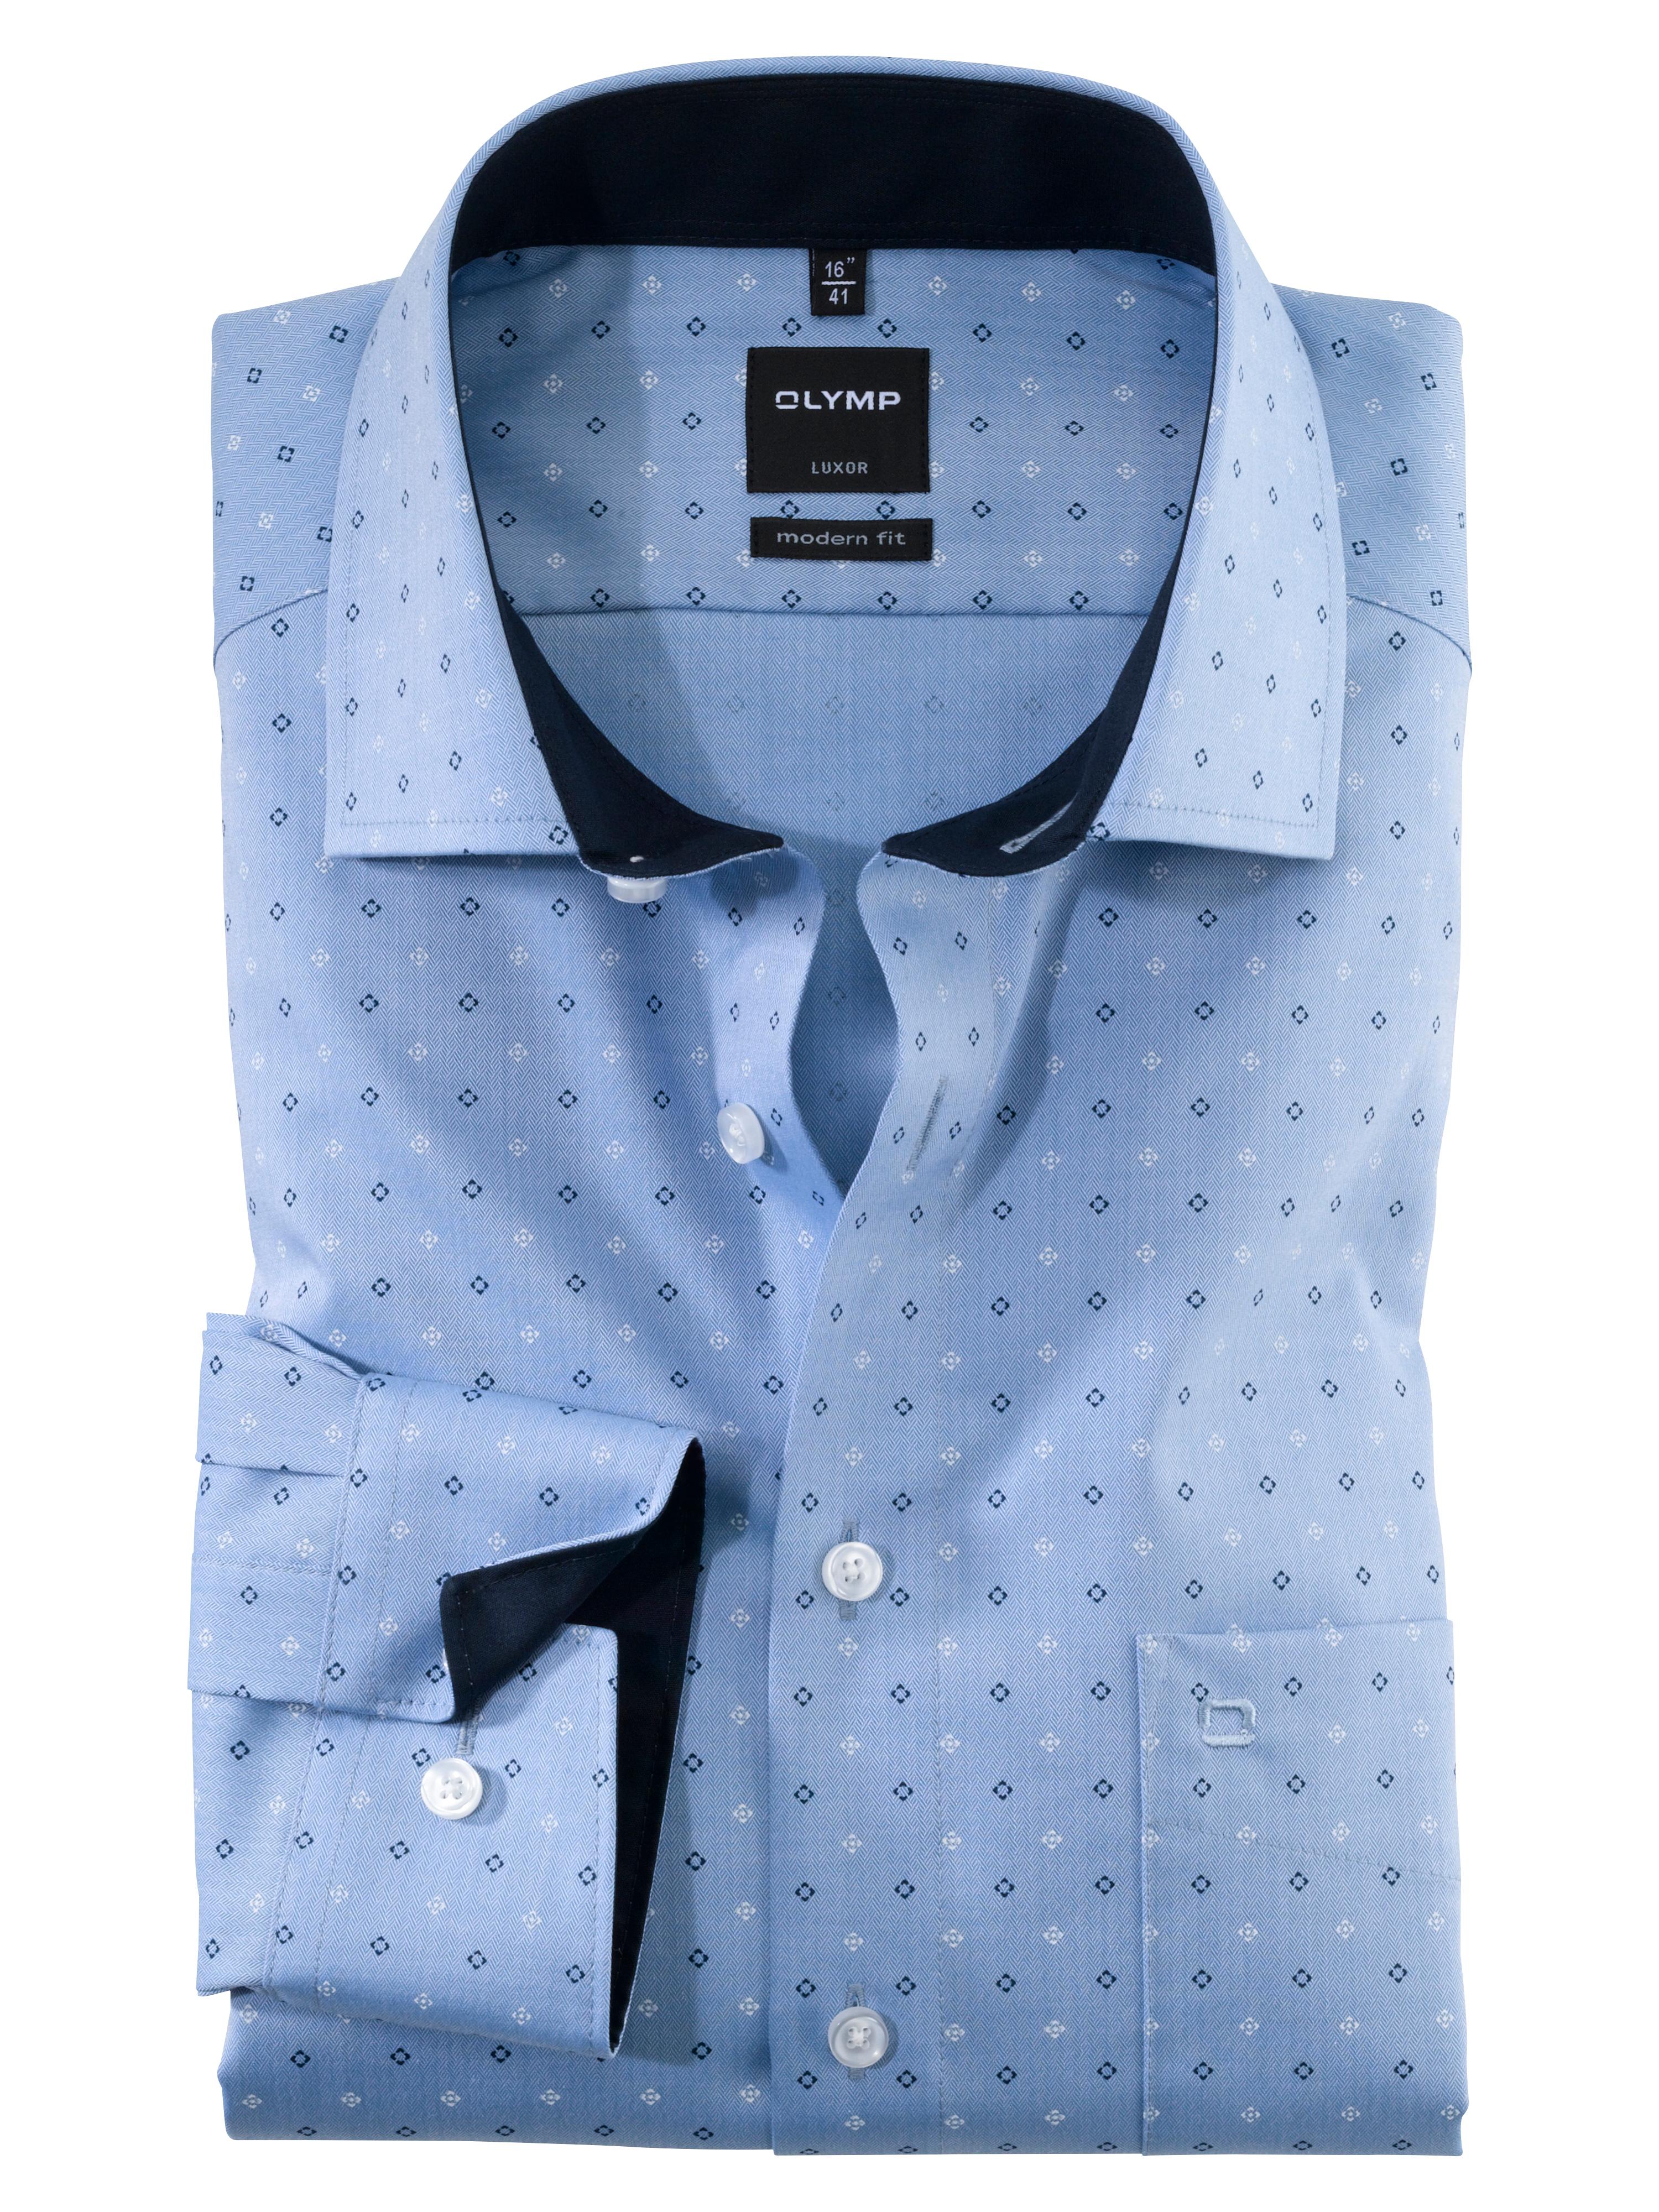 OLYMP Luxor Hemd, modern fit, Global Kent, Bleu, 41   Bekleidung > Hemden > Sonstige Hemden   Baumwolle   OLYMP